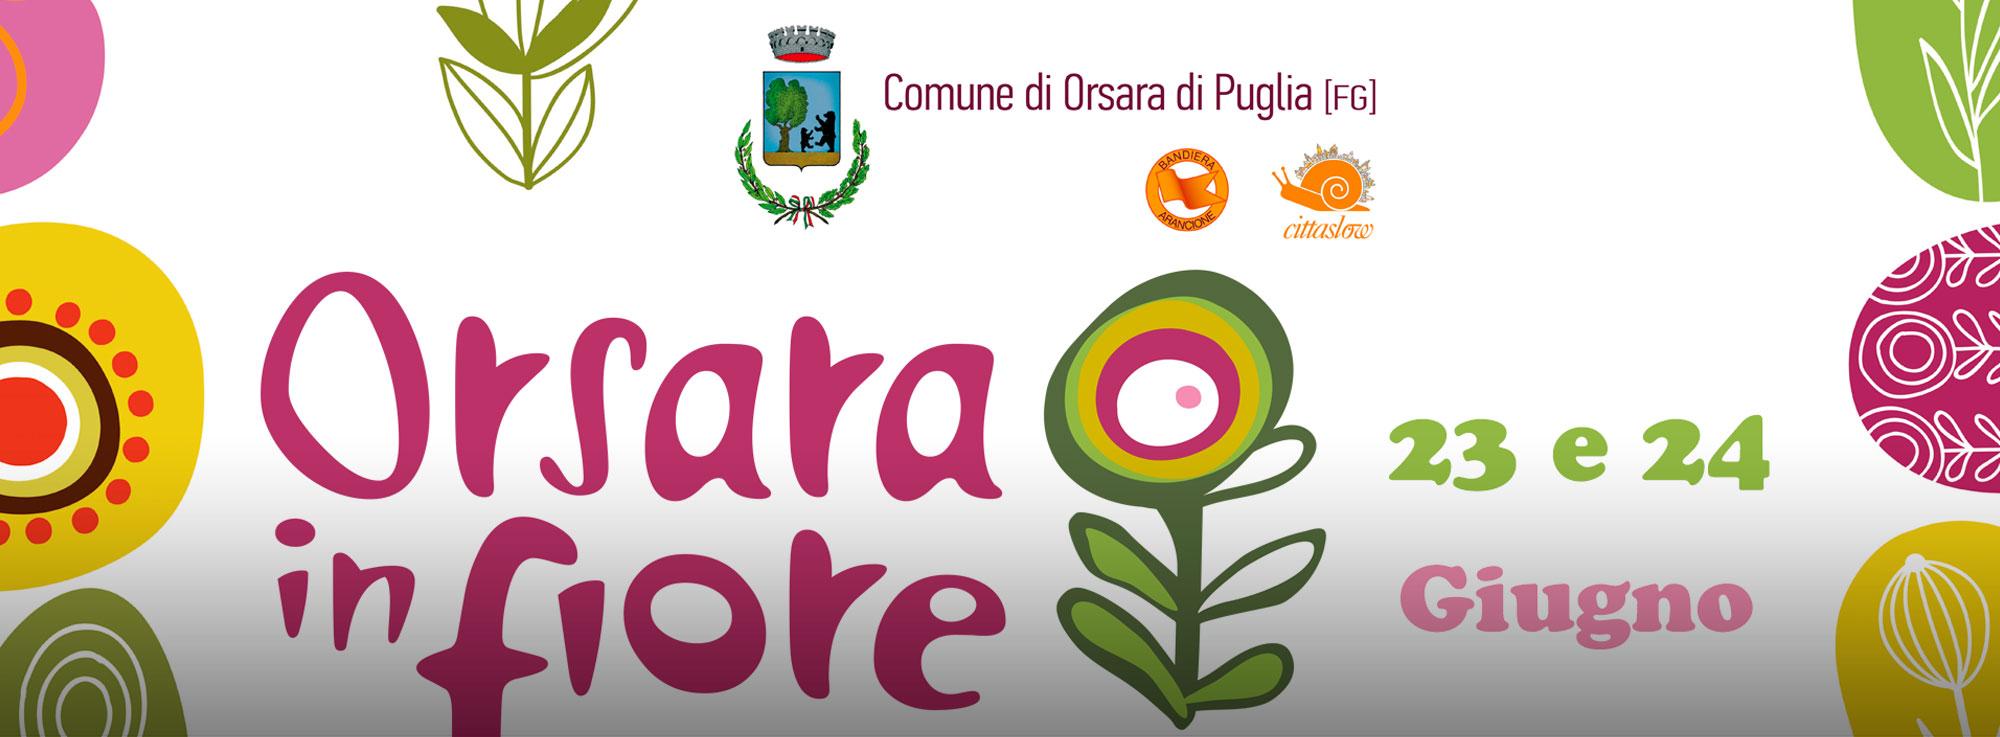 Orsara di Puglia: Orsara in Fiore